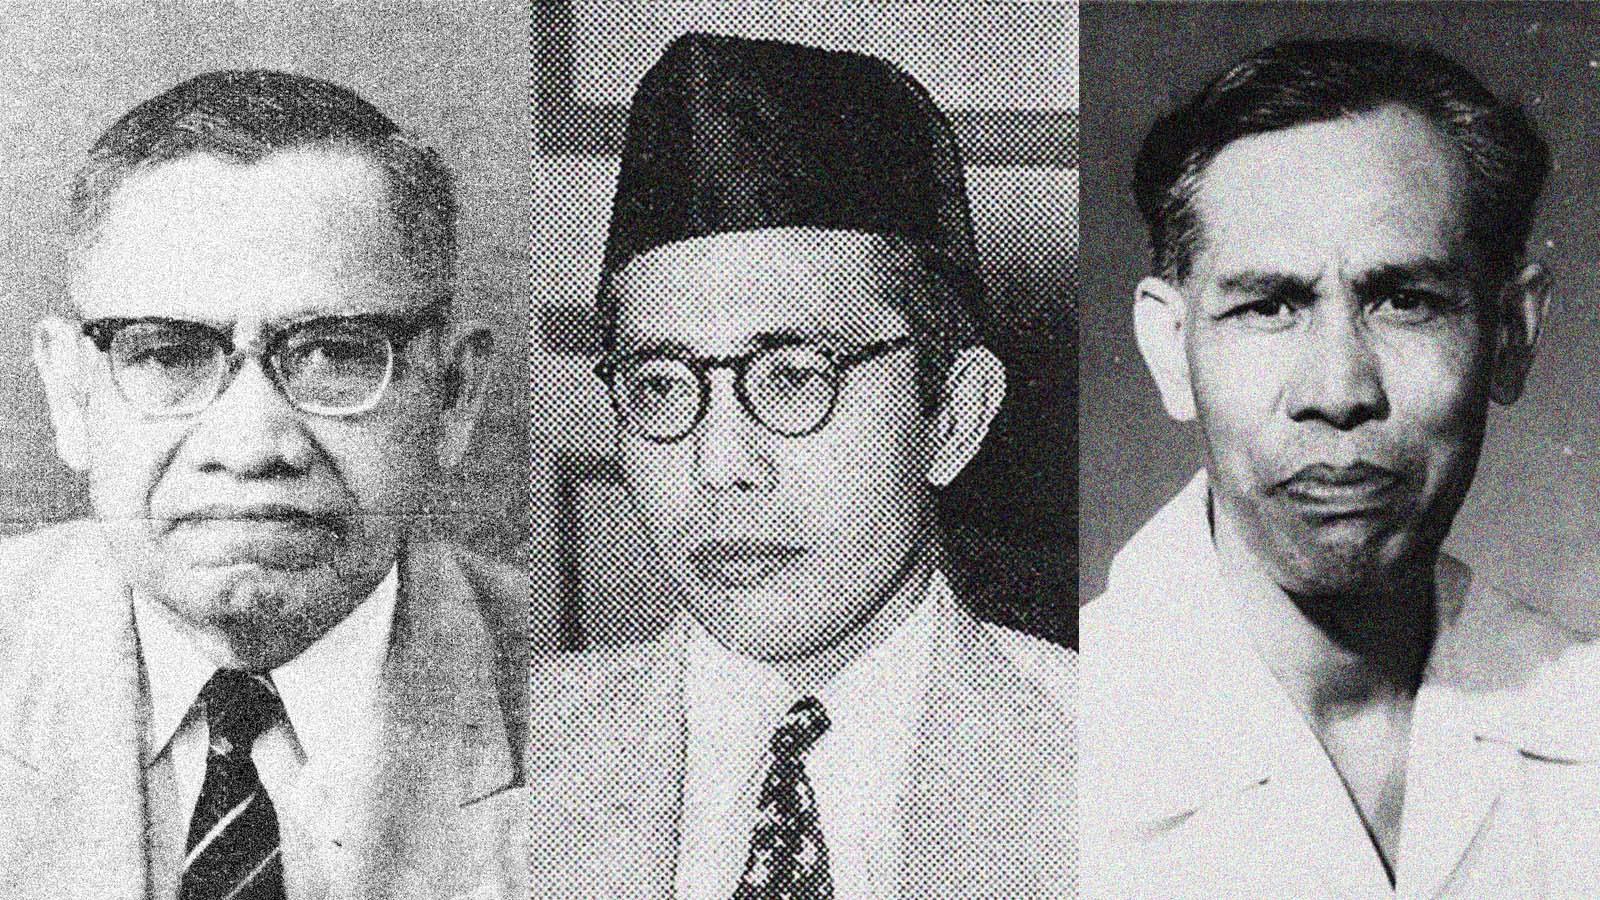 Persahabatan Lintas Ideologi: Natsir, Kasimo, dan Leimena